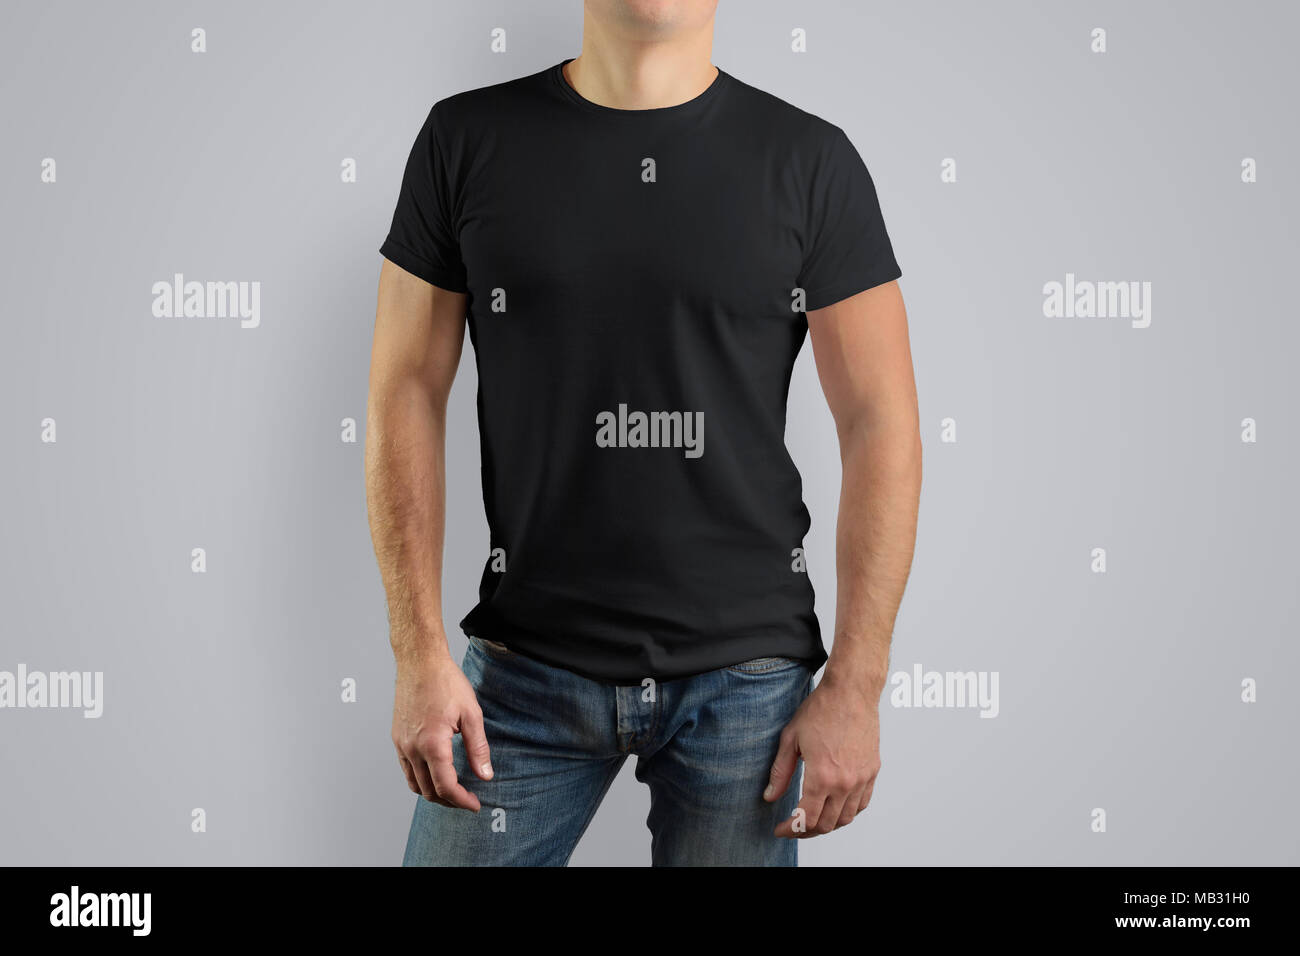 Atemberaubend Leere T Shirt Vorlage Galerie - Entry Level Resume ...